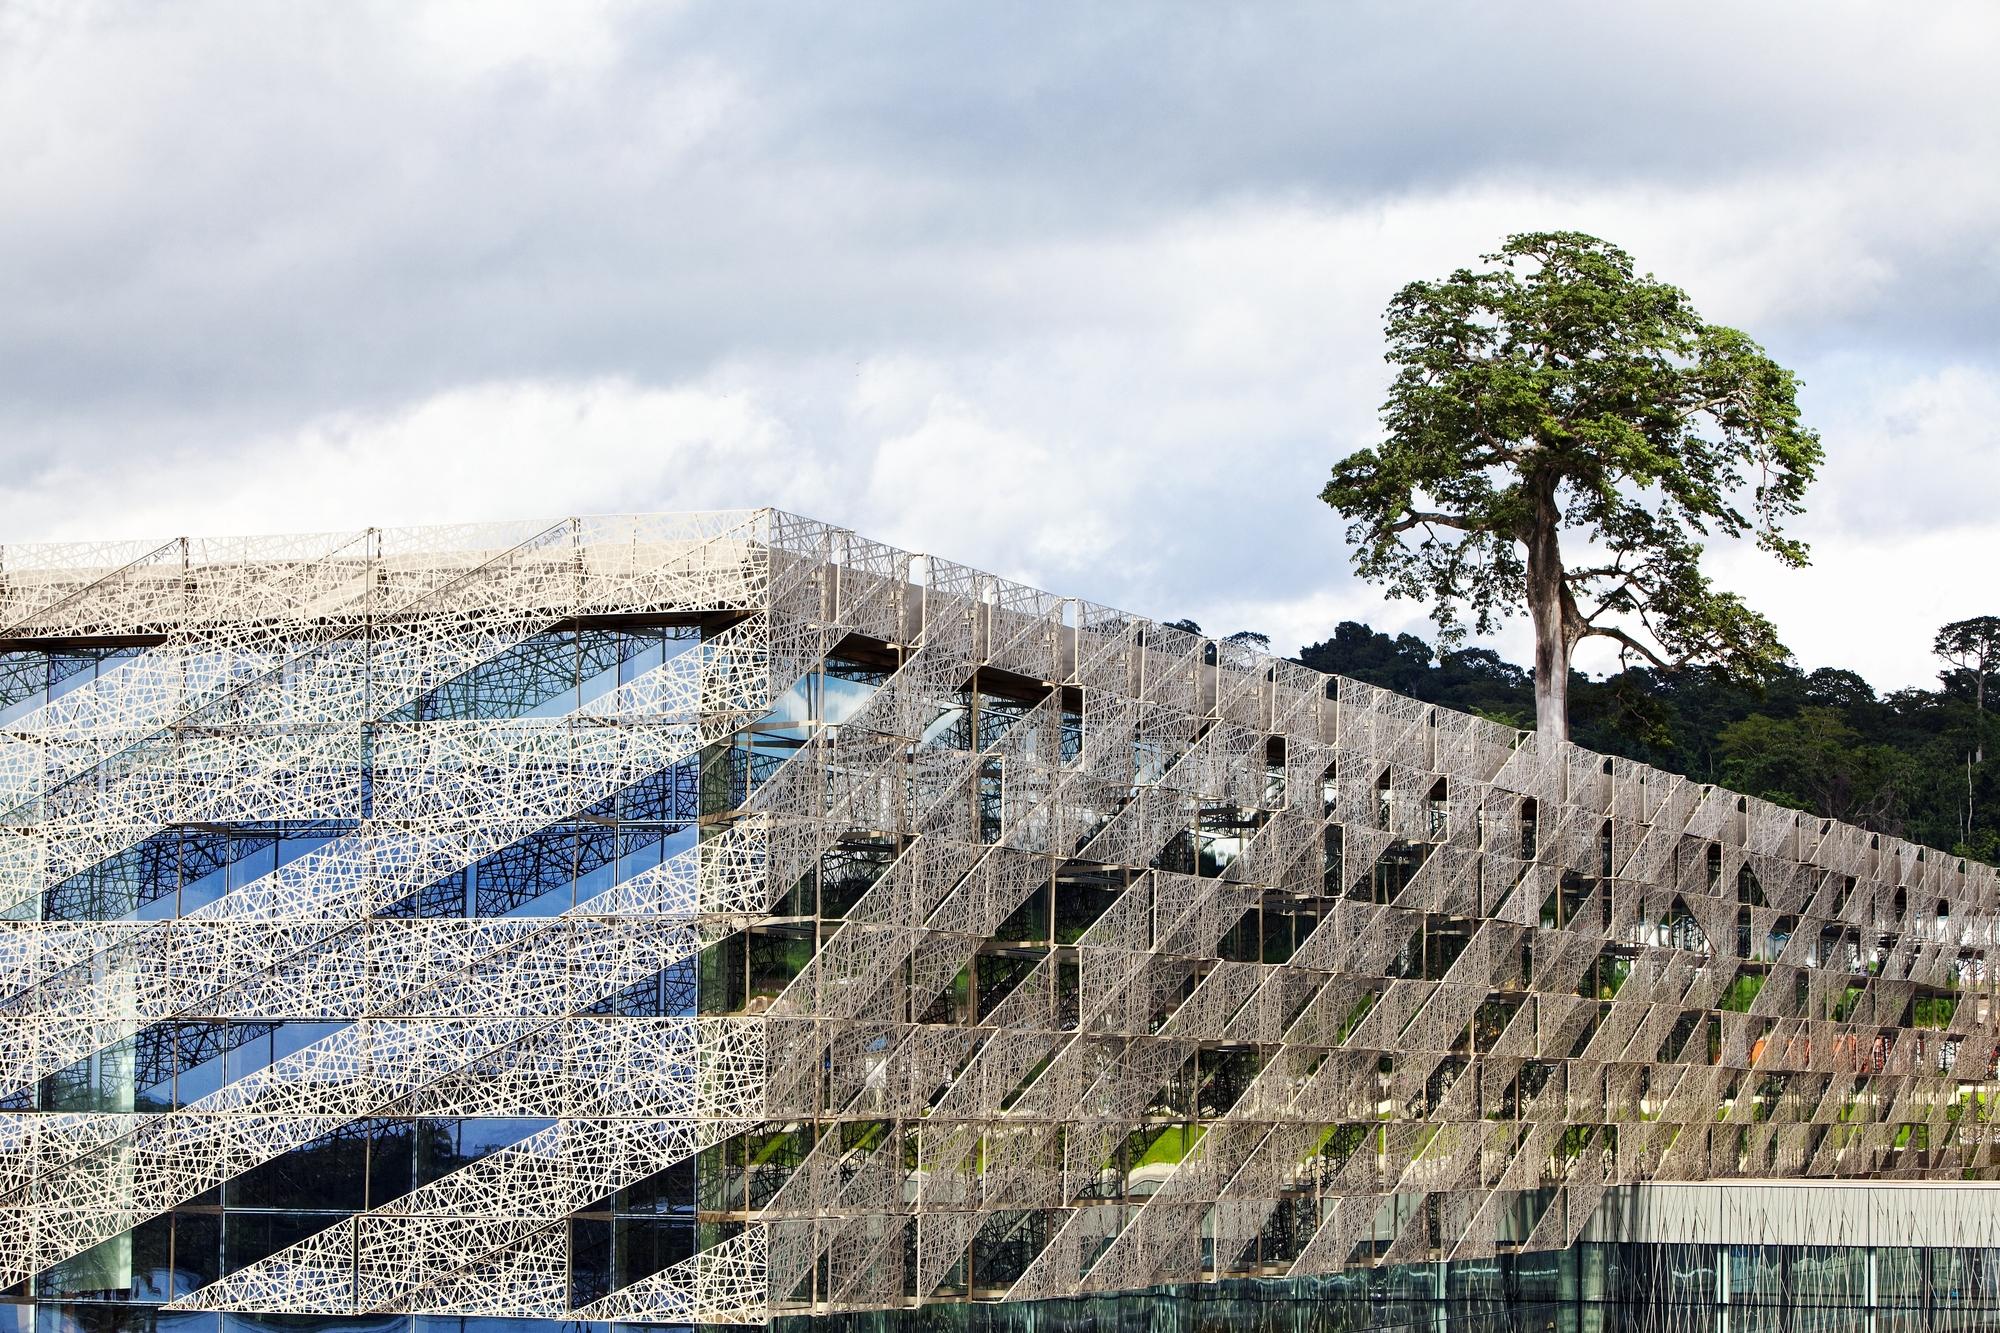 Congresso de Sipopo / Tabanlioglu Architects, © Emre Dörter